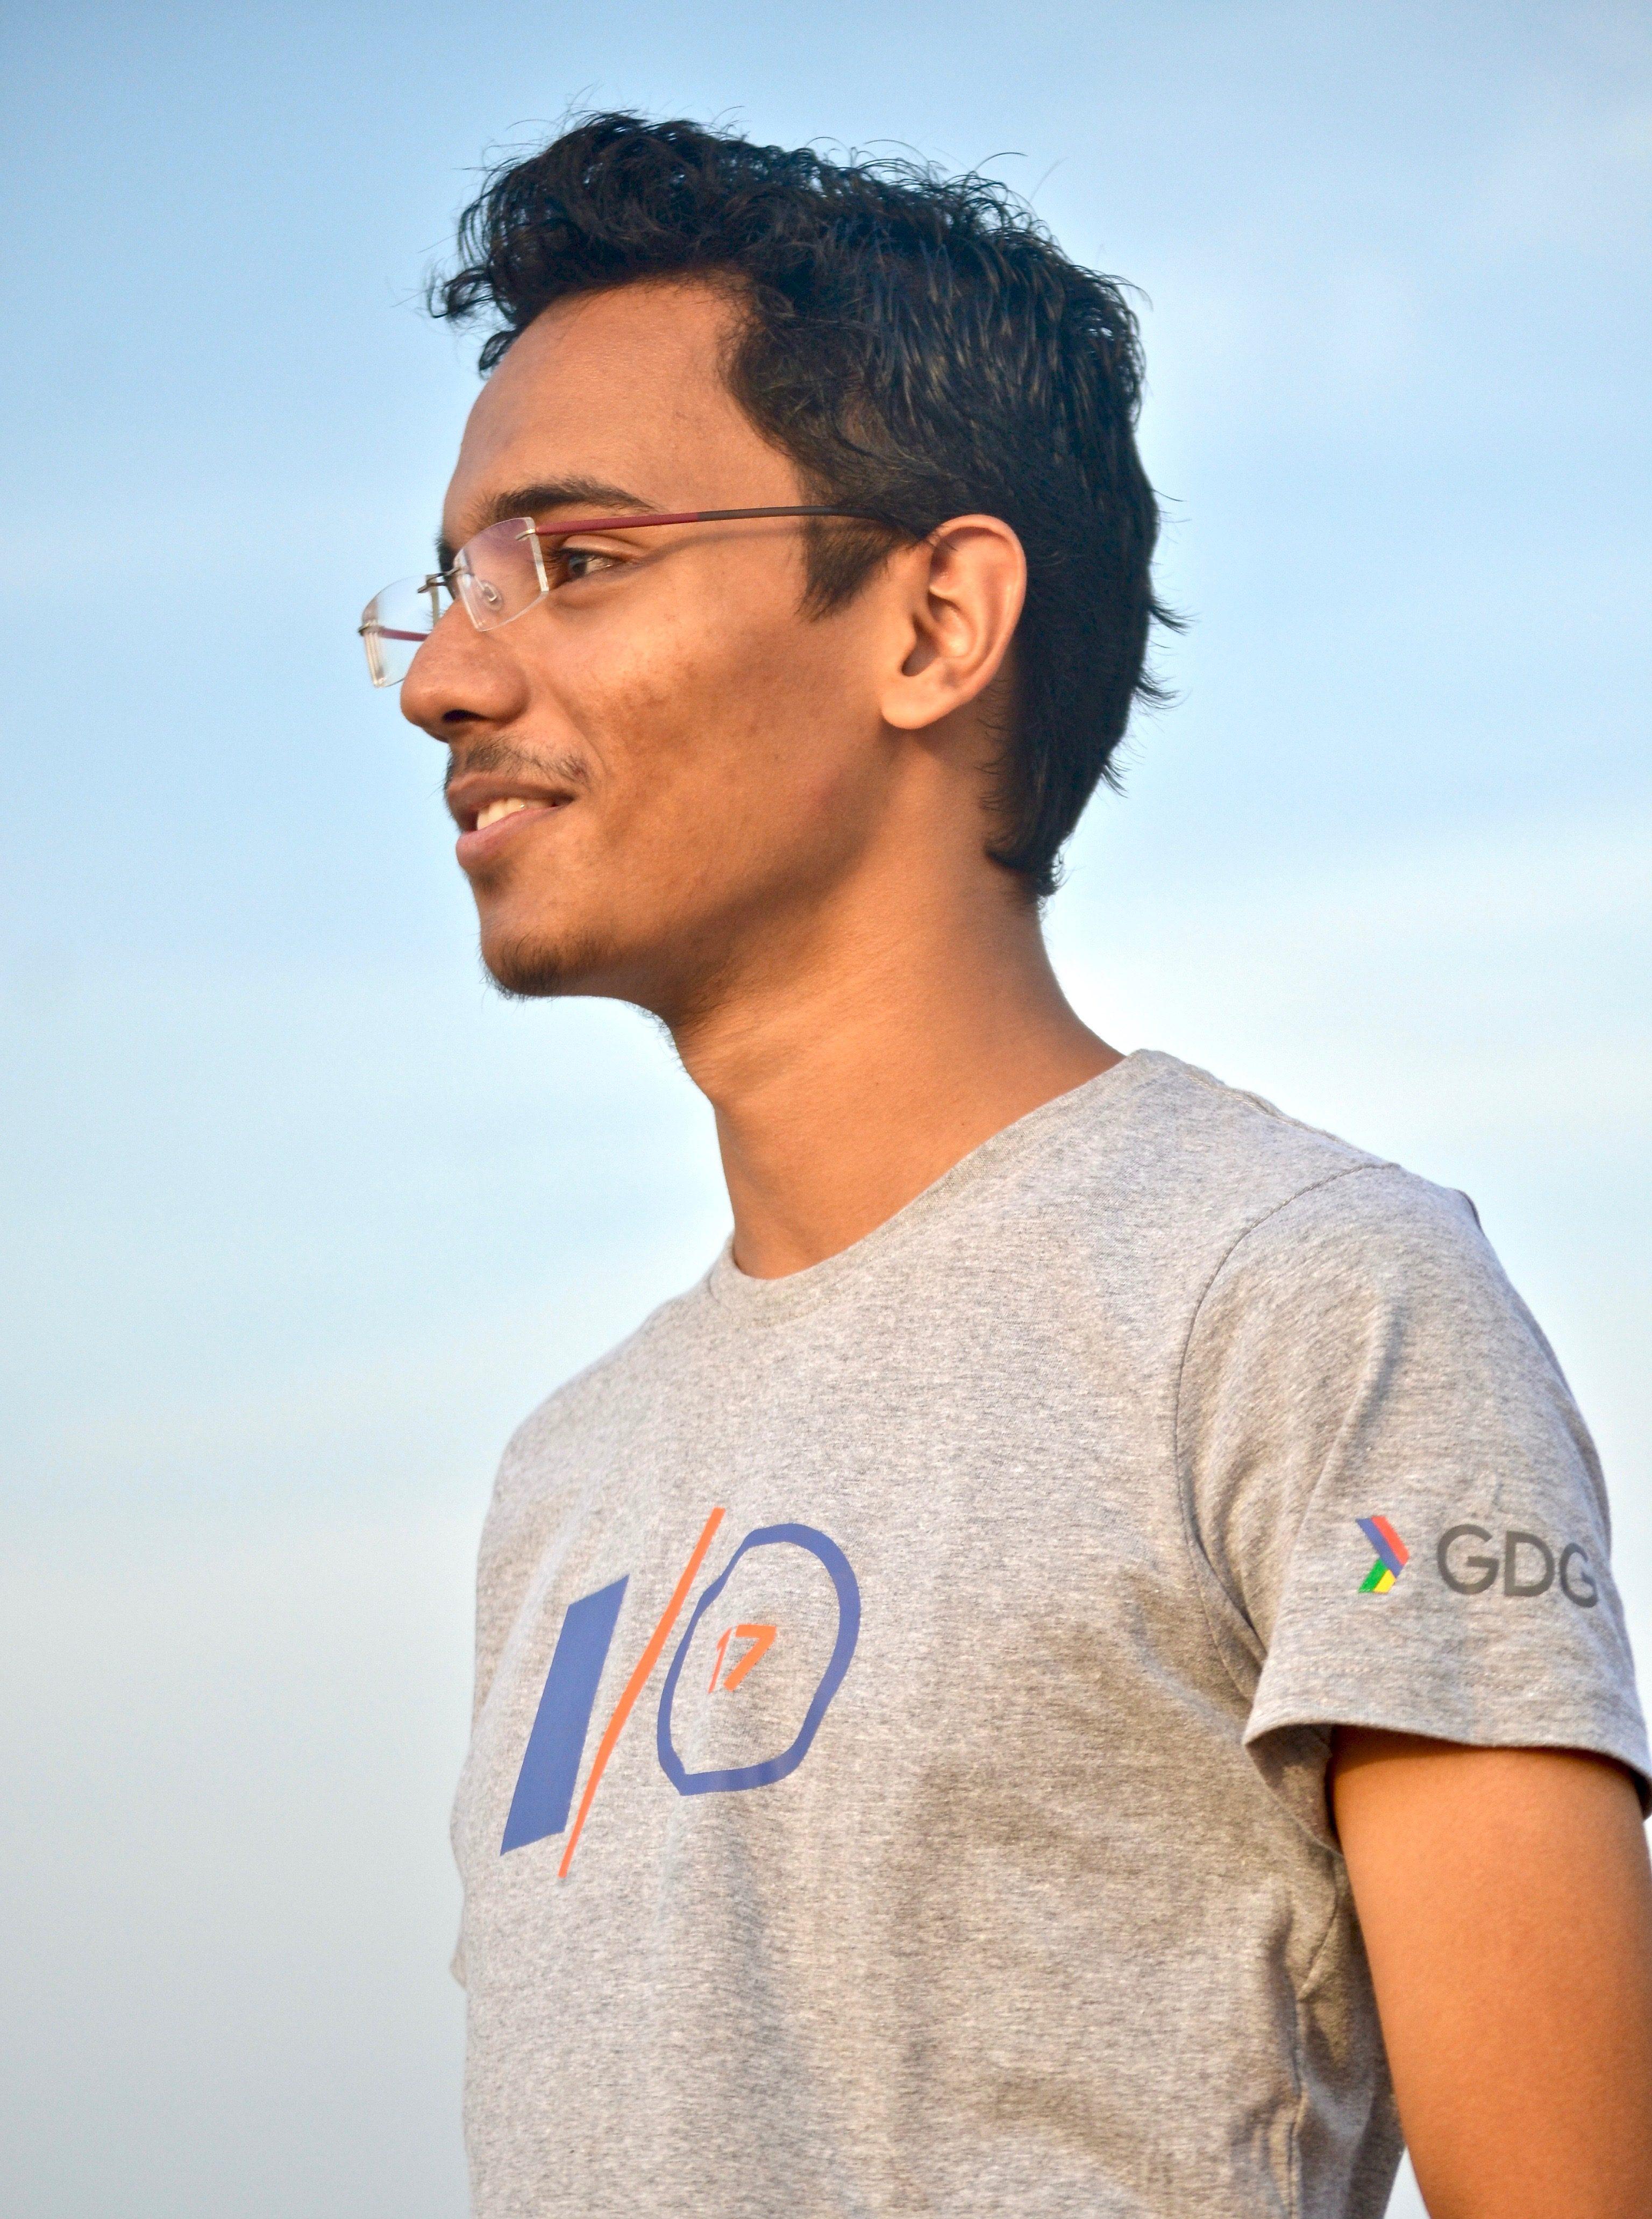 Changemaker Spotlight: Deepraj Pandey